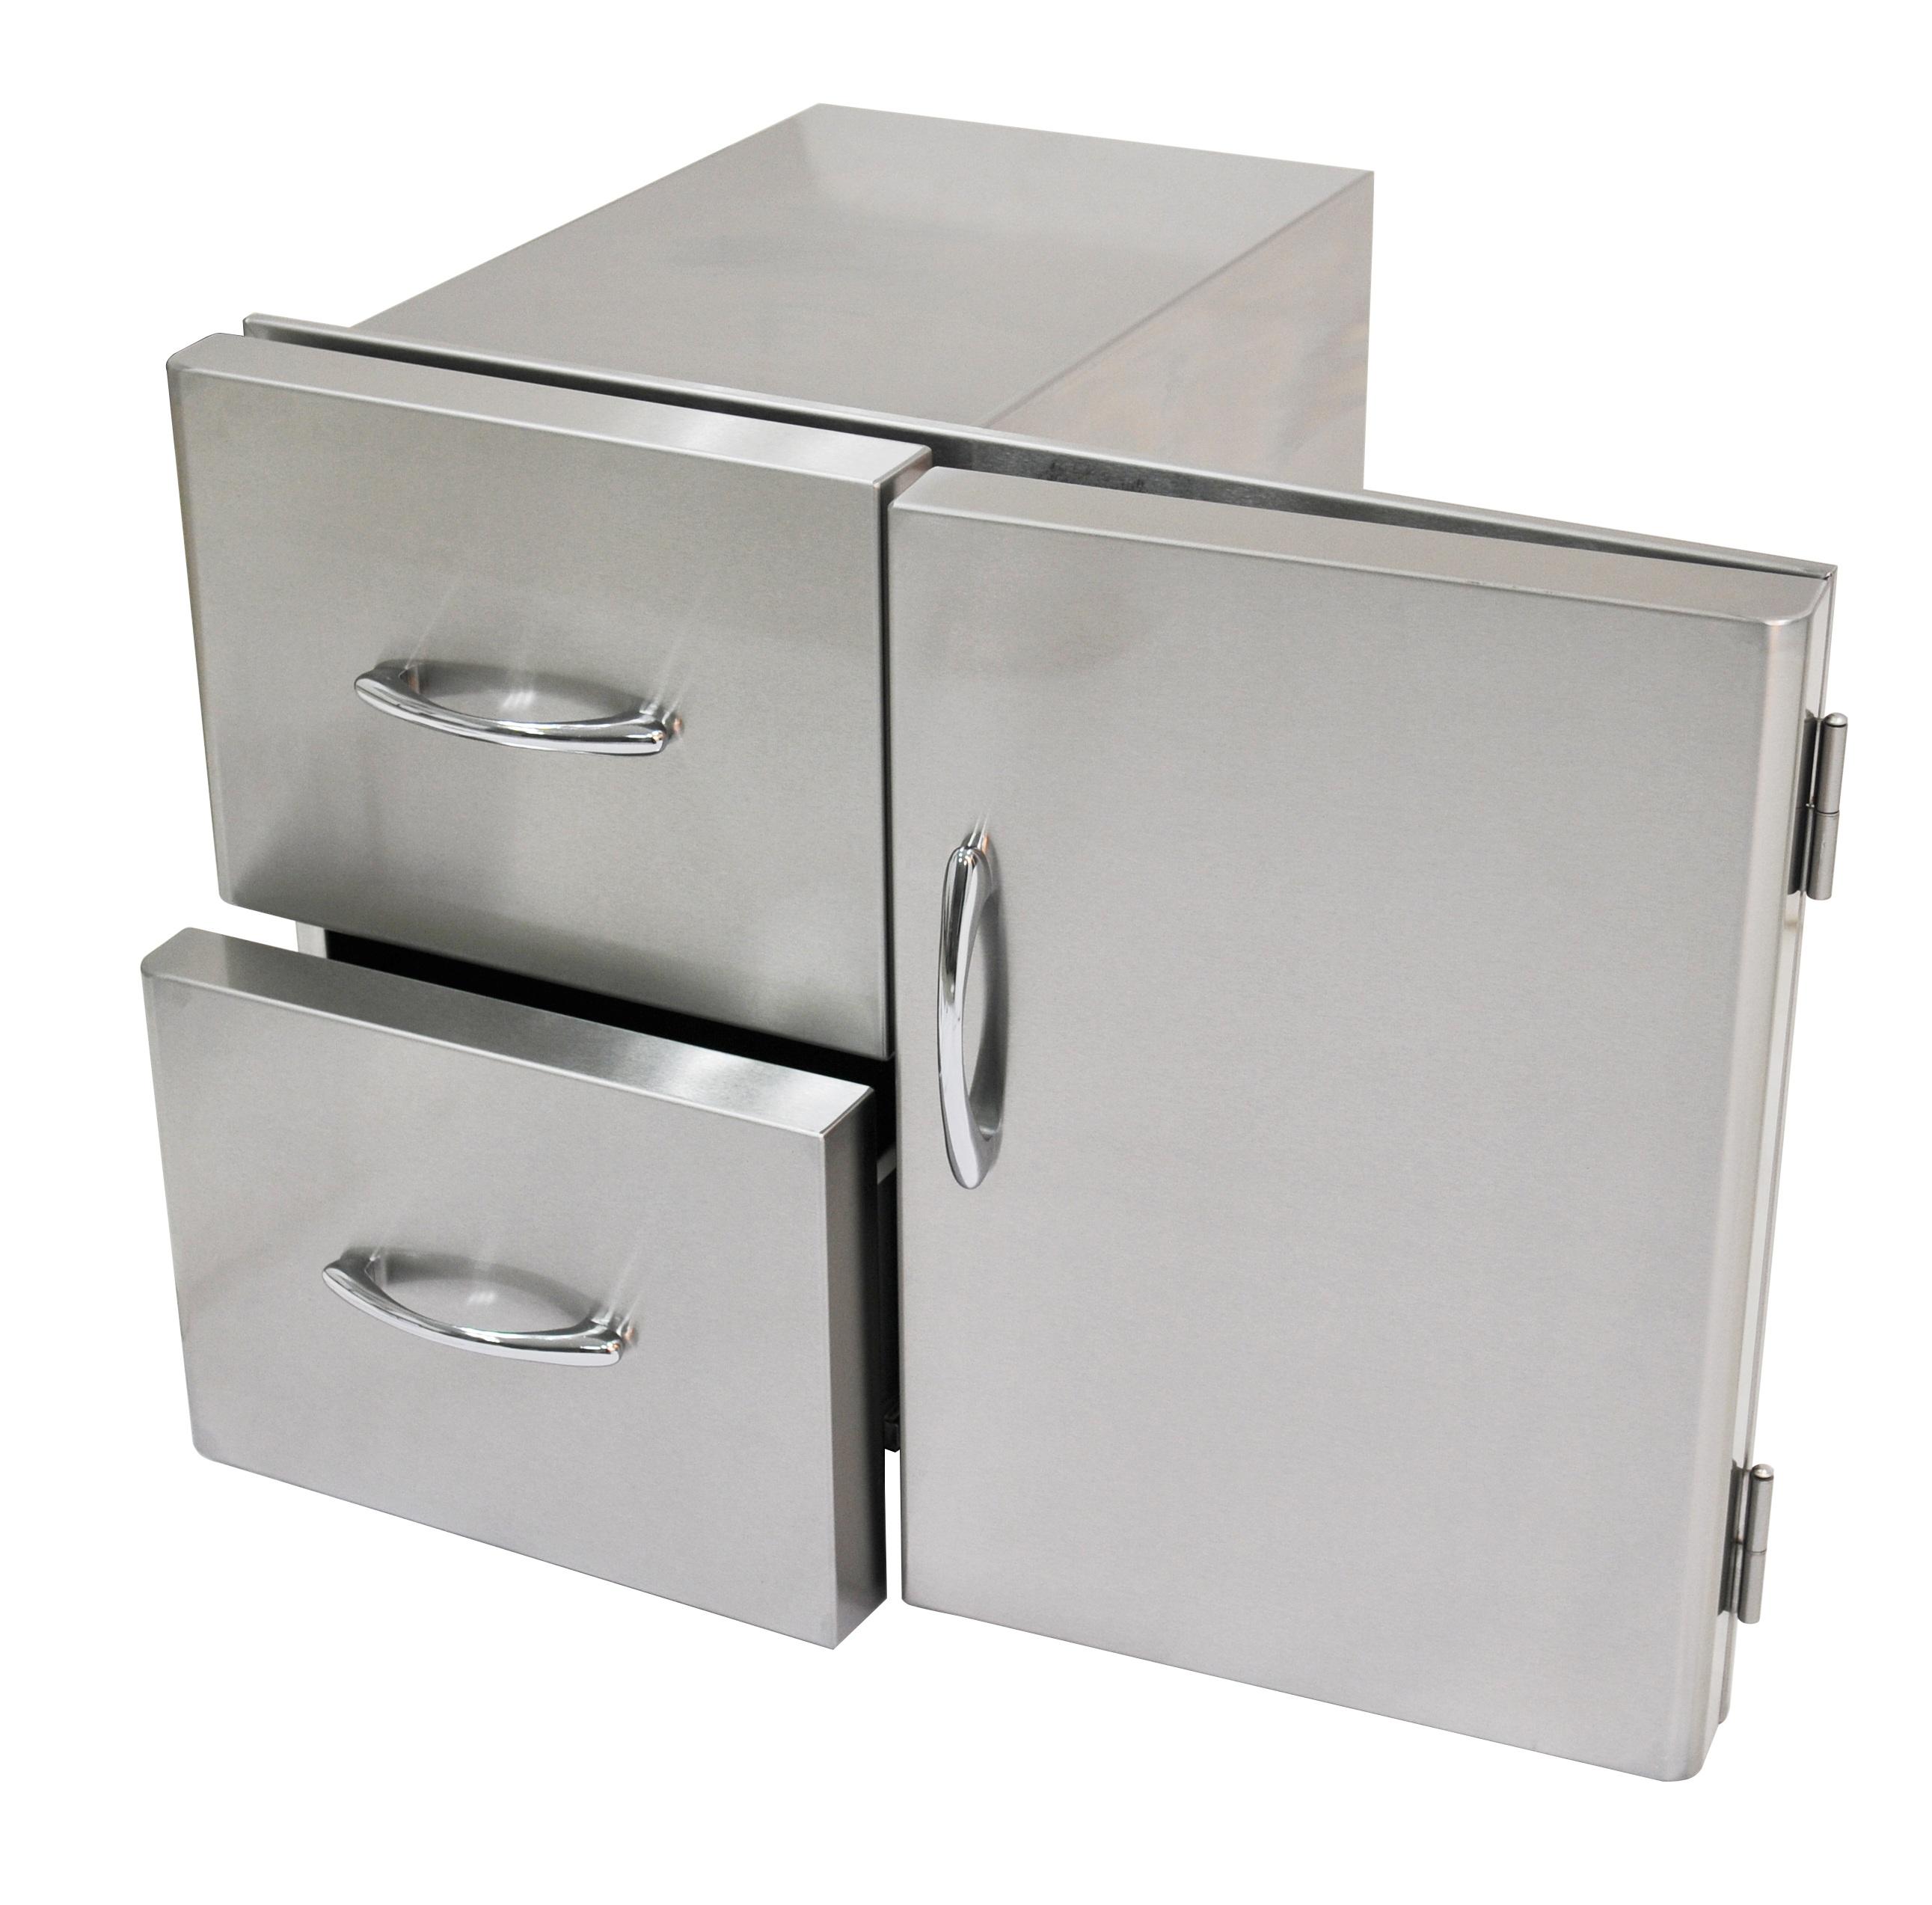 Stainless Steel Door : Built in additions stainless steel door and drawers